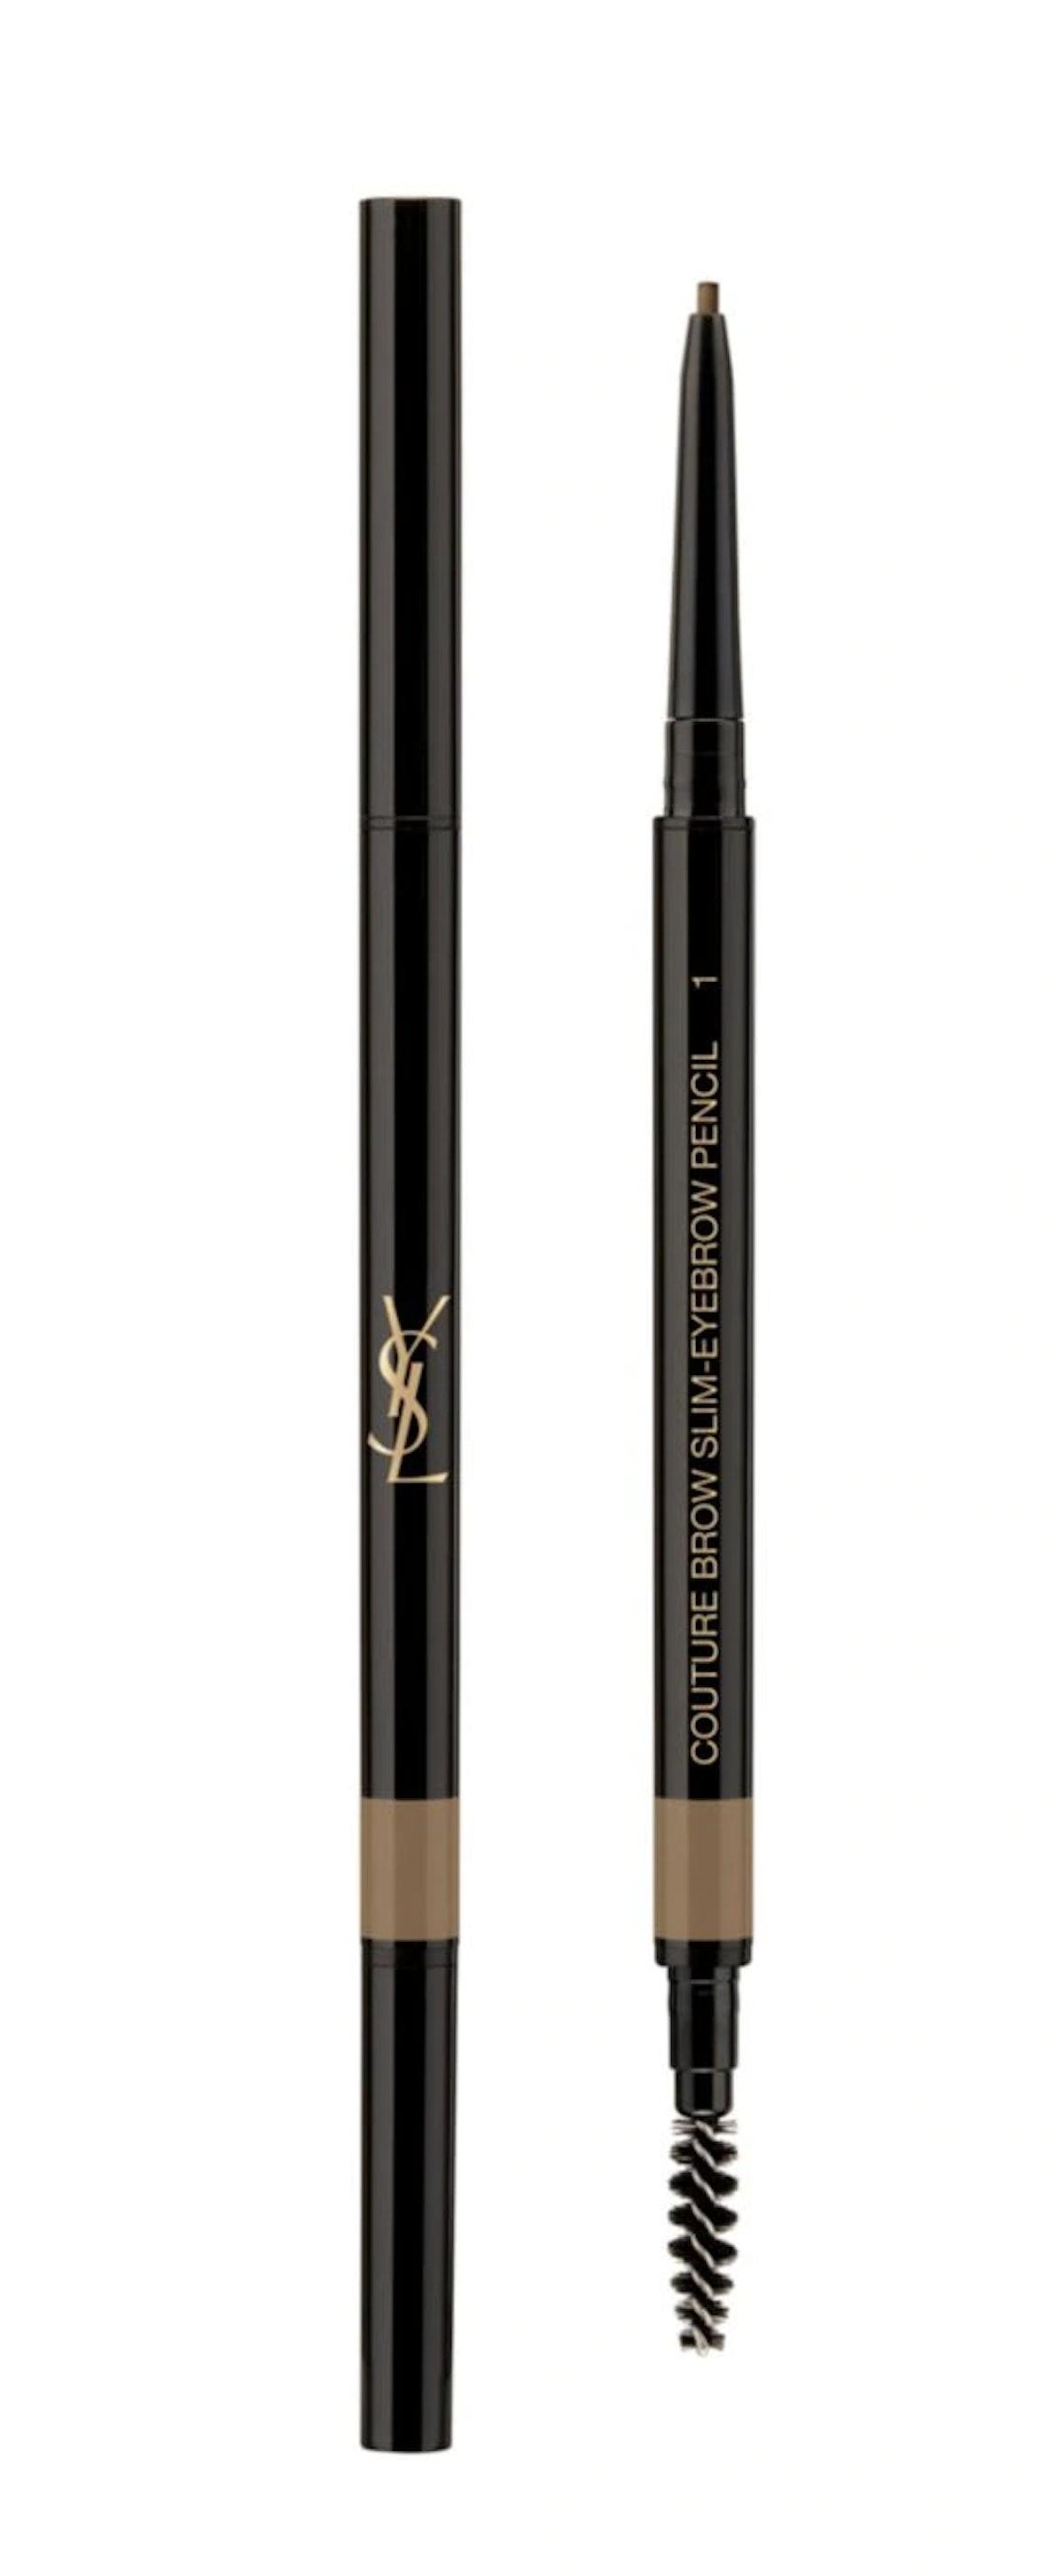 Yves Saint Laurent Couture Brow Slim Eyebrow Pencil